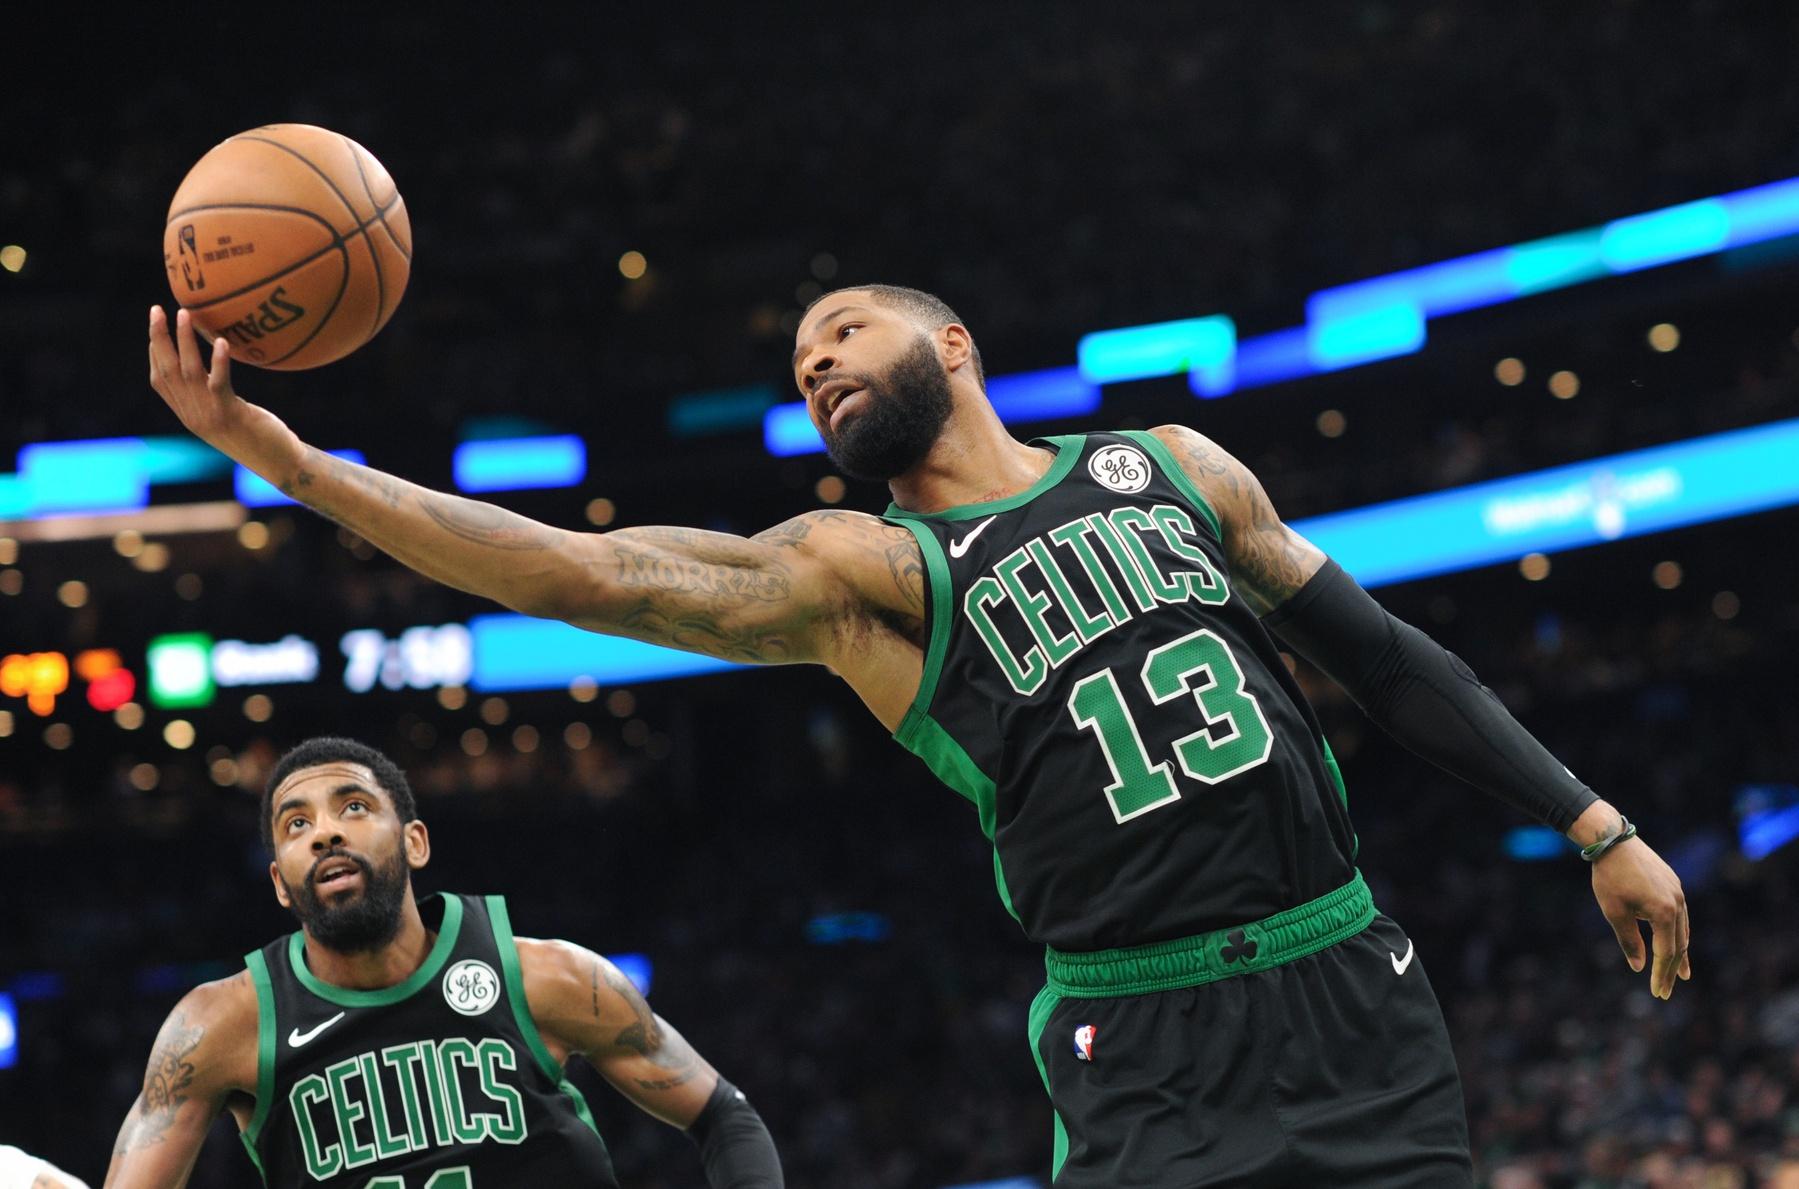 Recap: Boston Celtics win Game 1 in defensive struggle vs Indiana Pacers